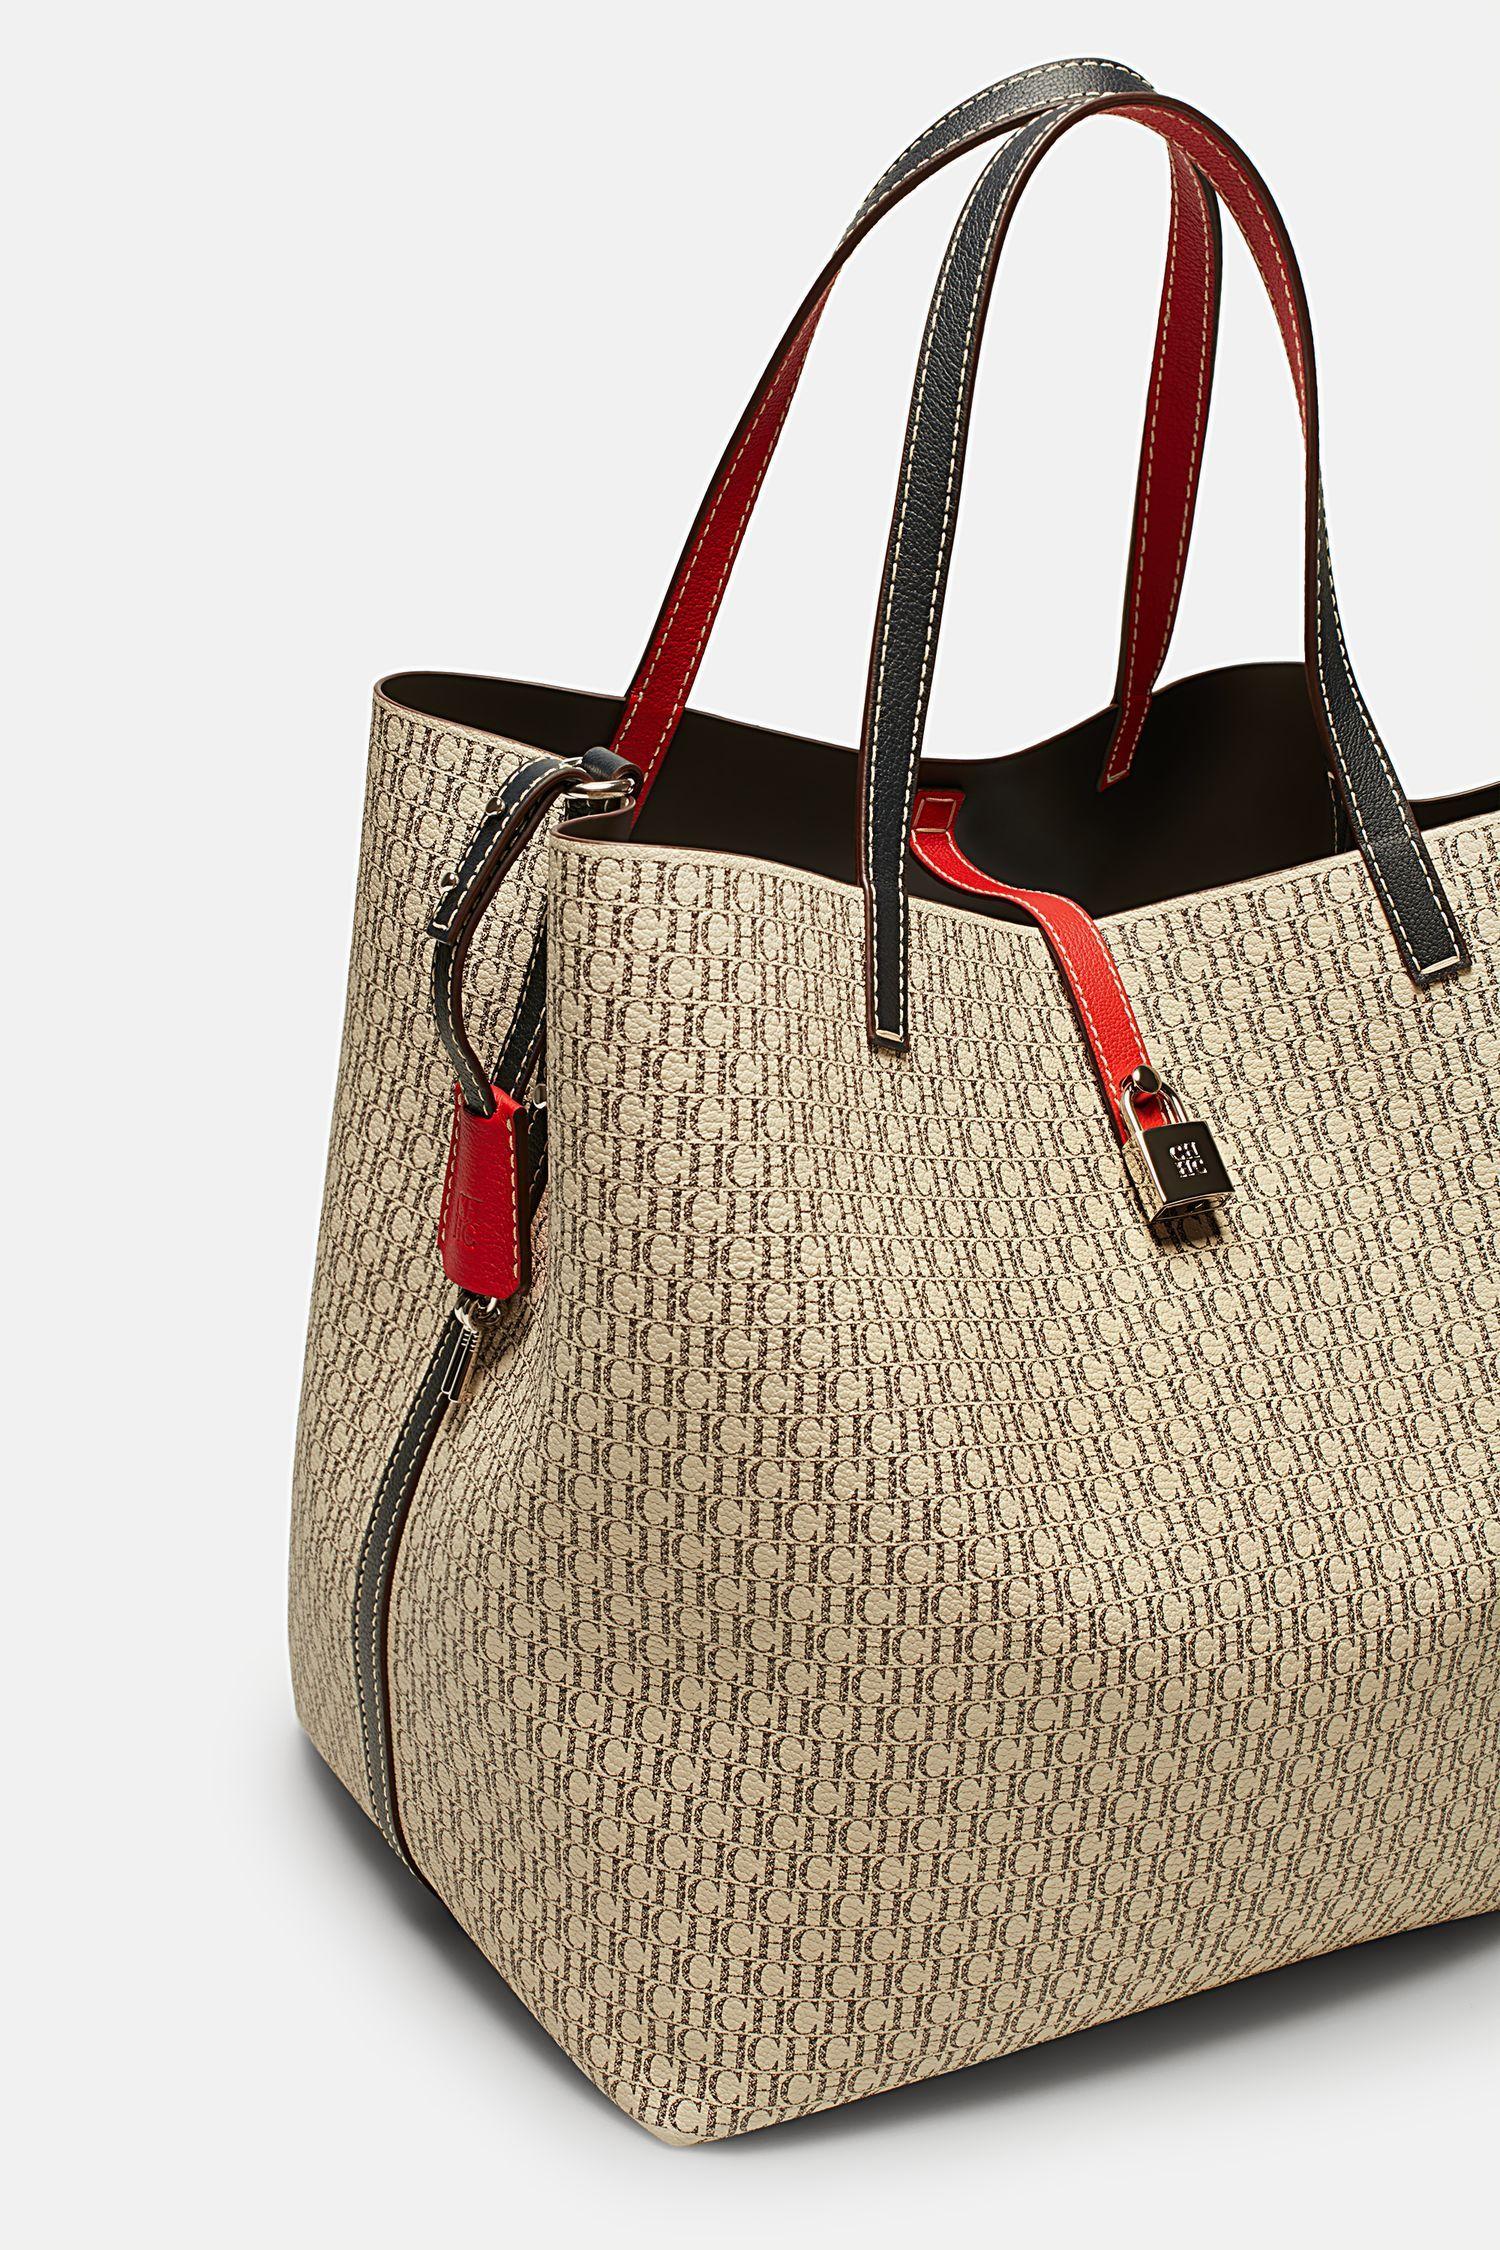 95bb2c067 Matryoshka Locked L | Large shoulder bag Ch Carolina Herrera, Large  Shoulder Bags, Casual